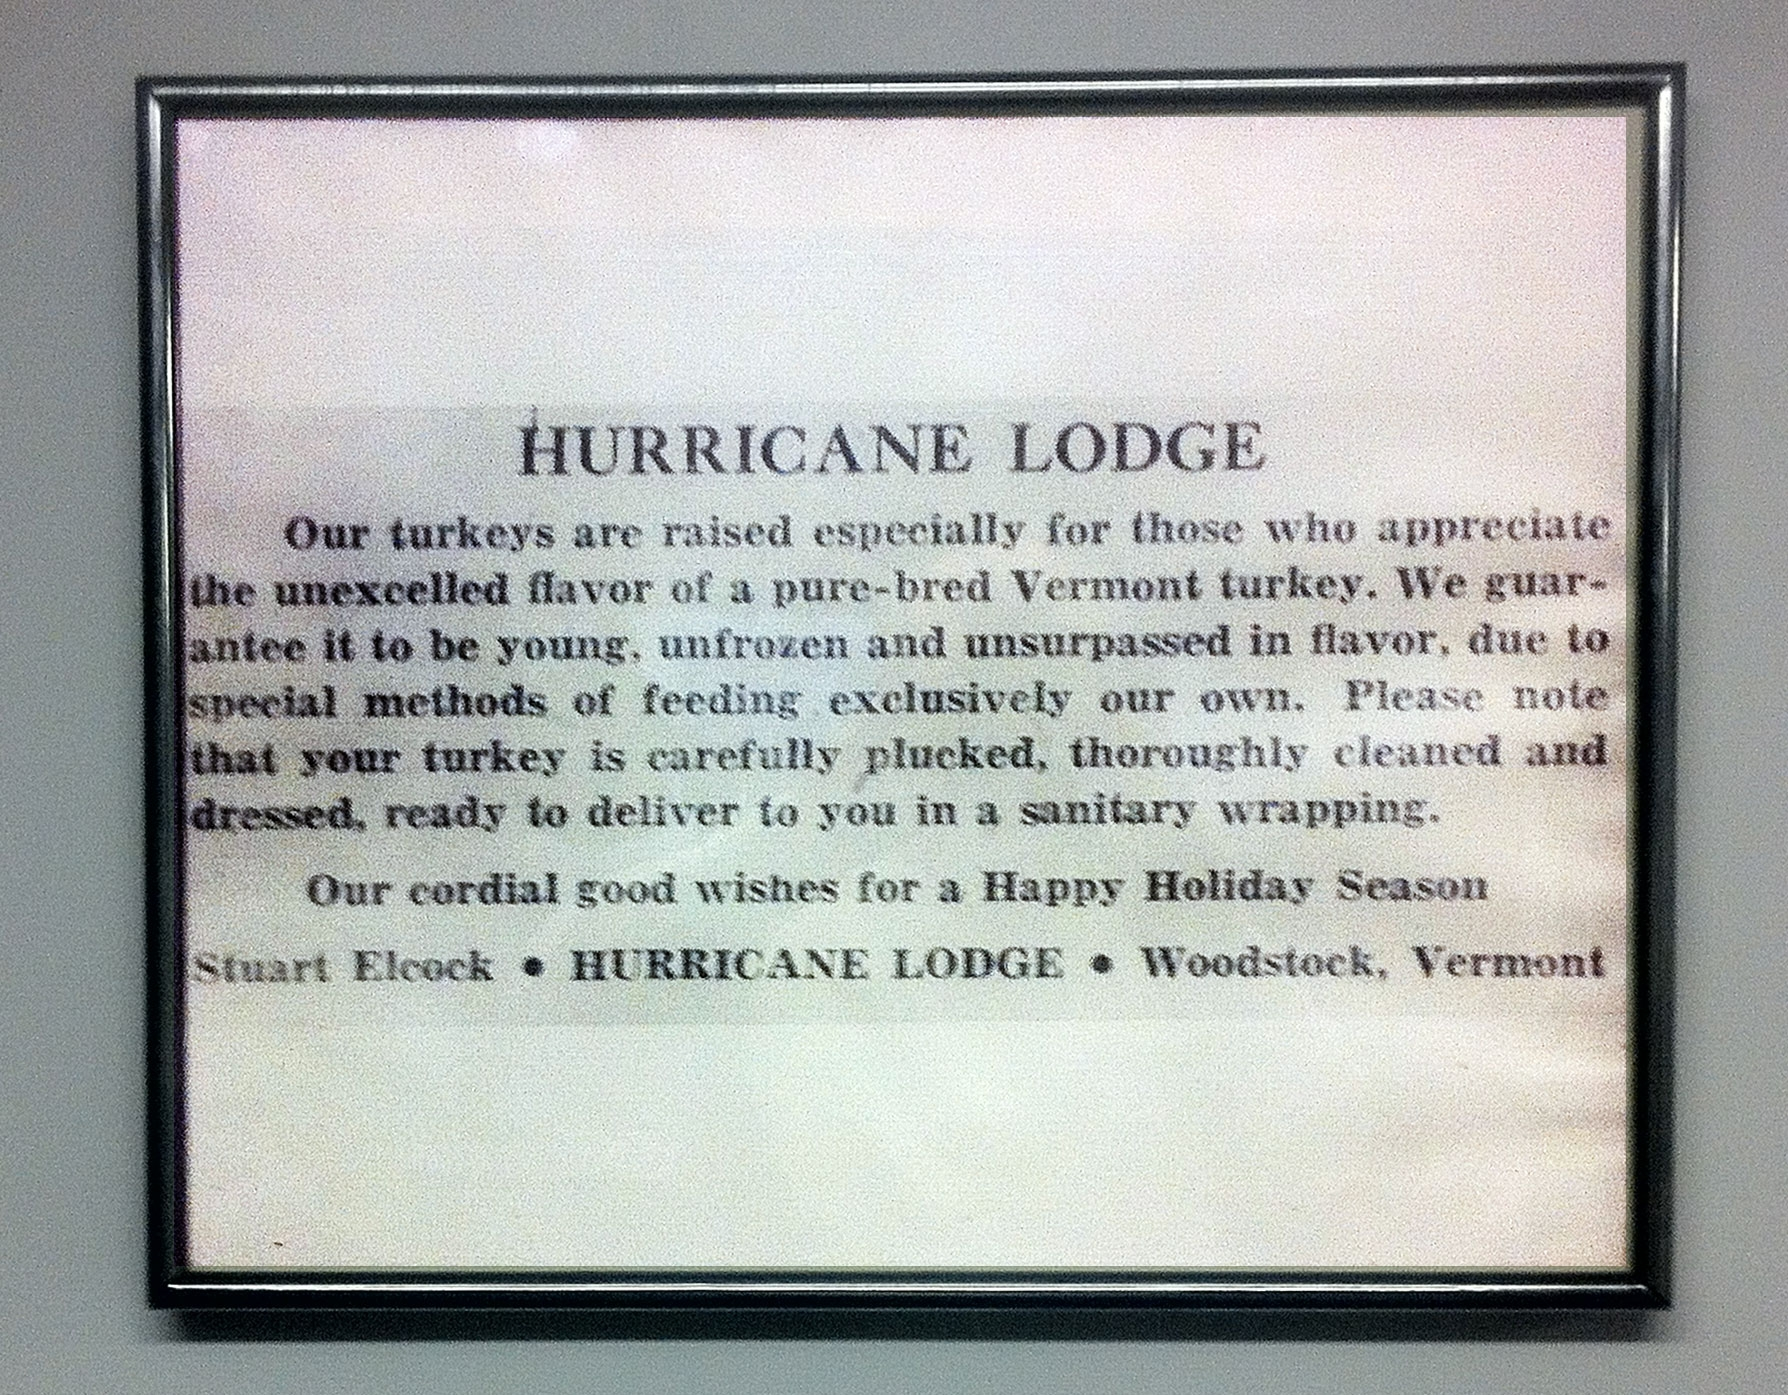 Hurricane Lodge Turkey Farm